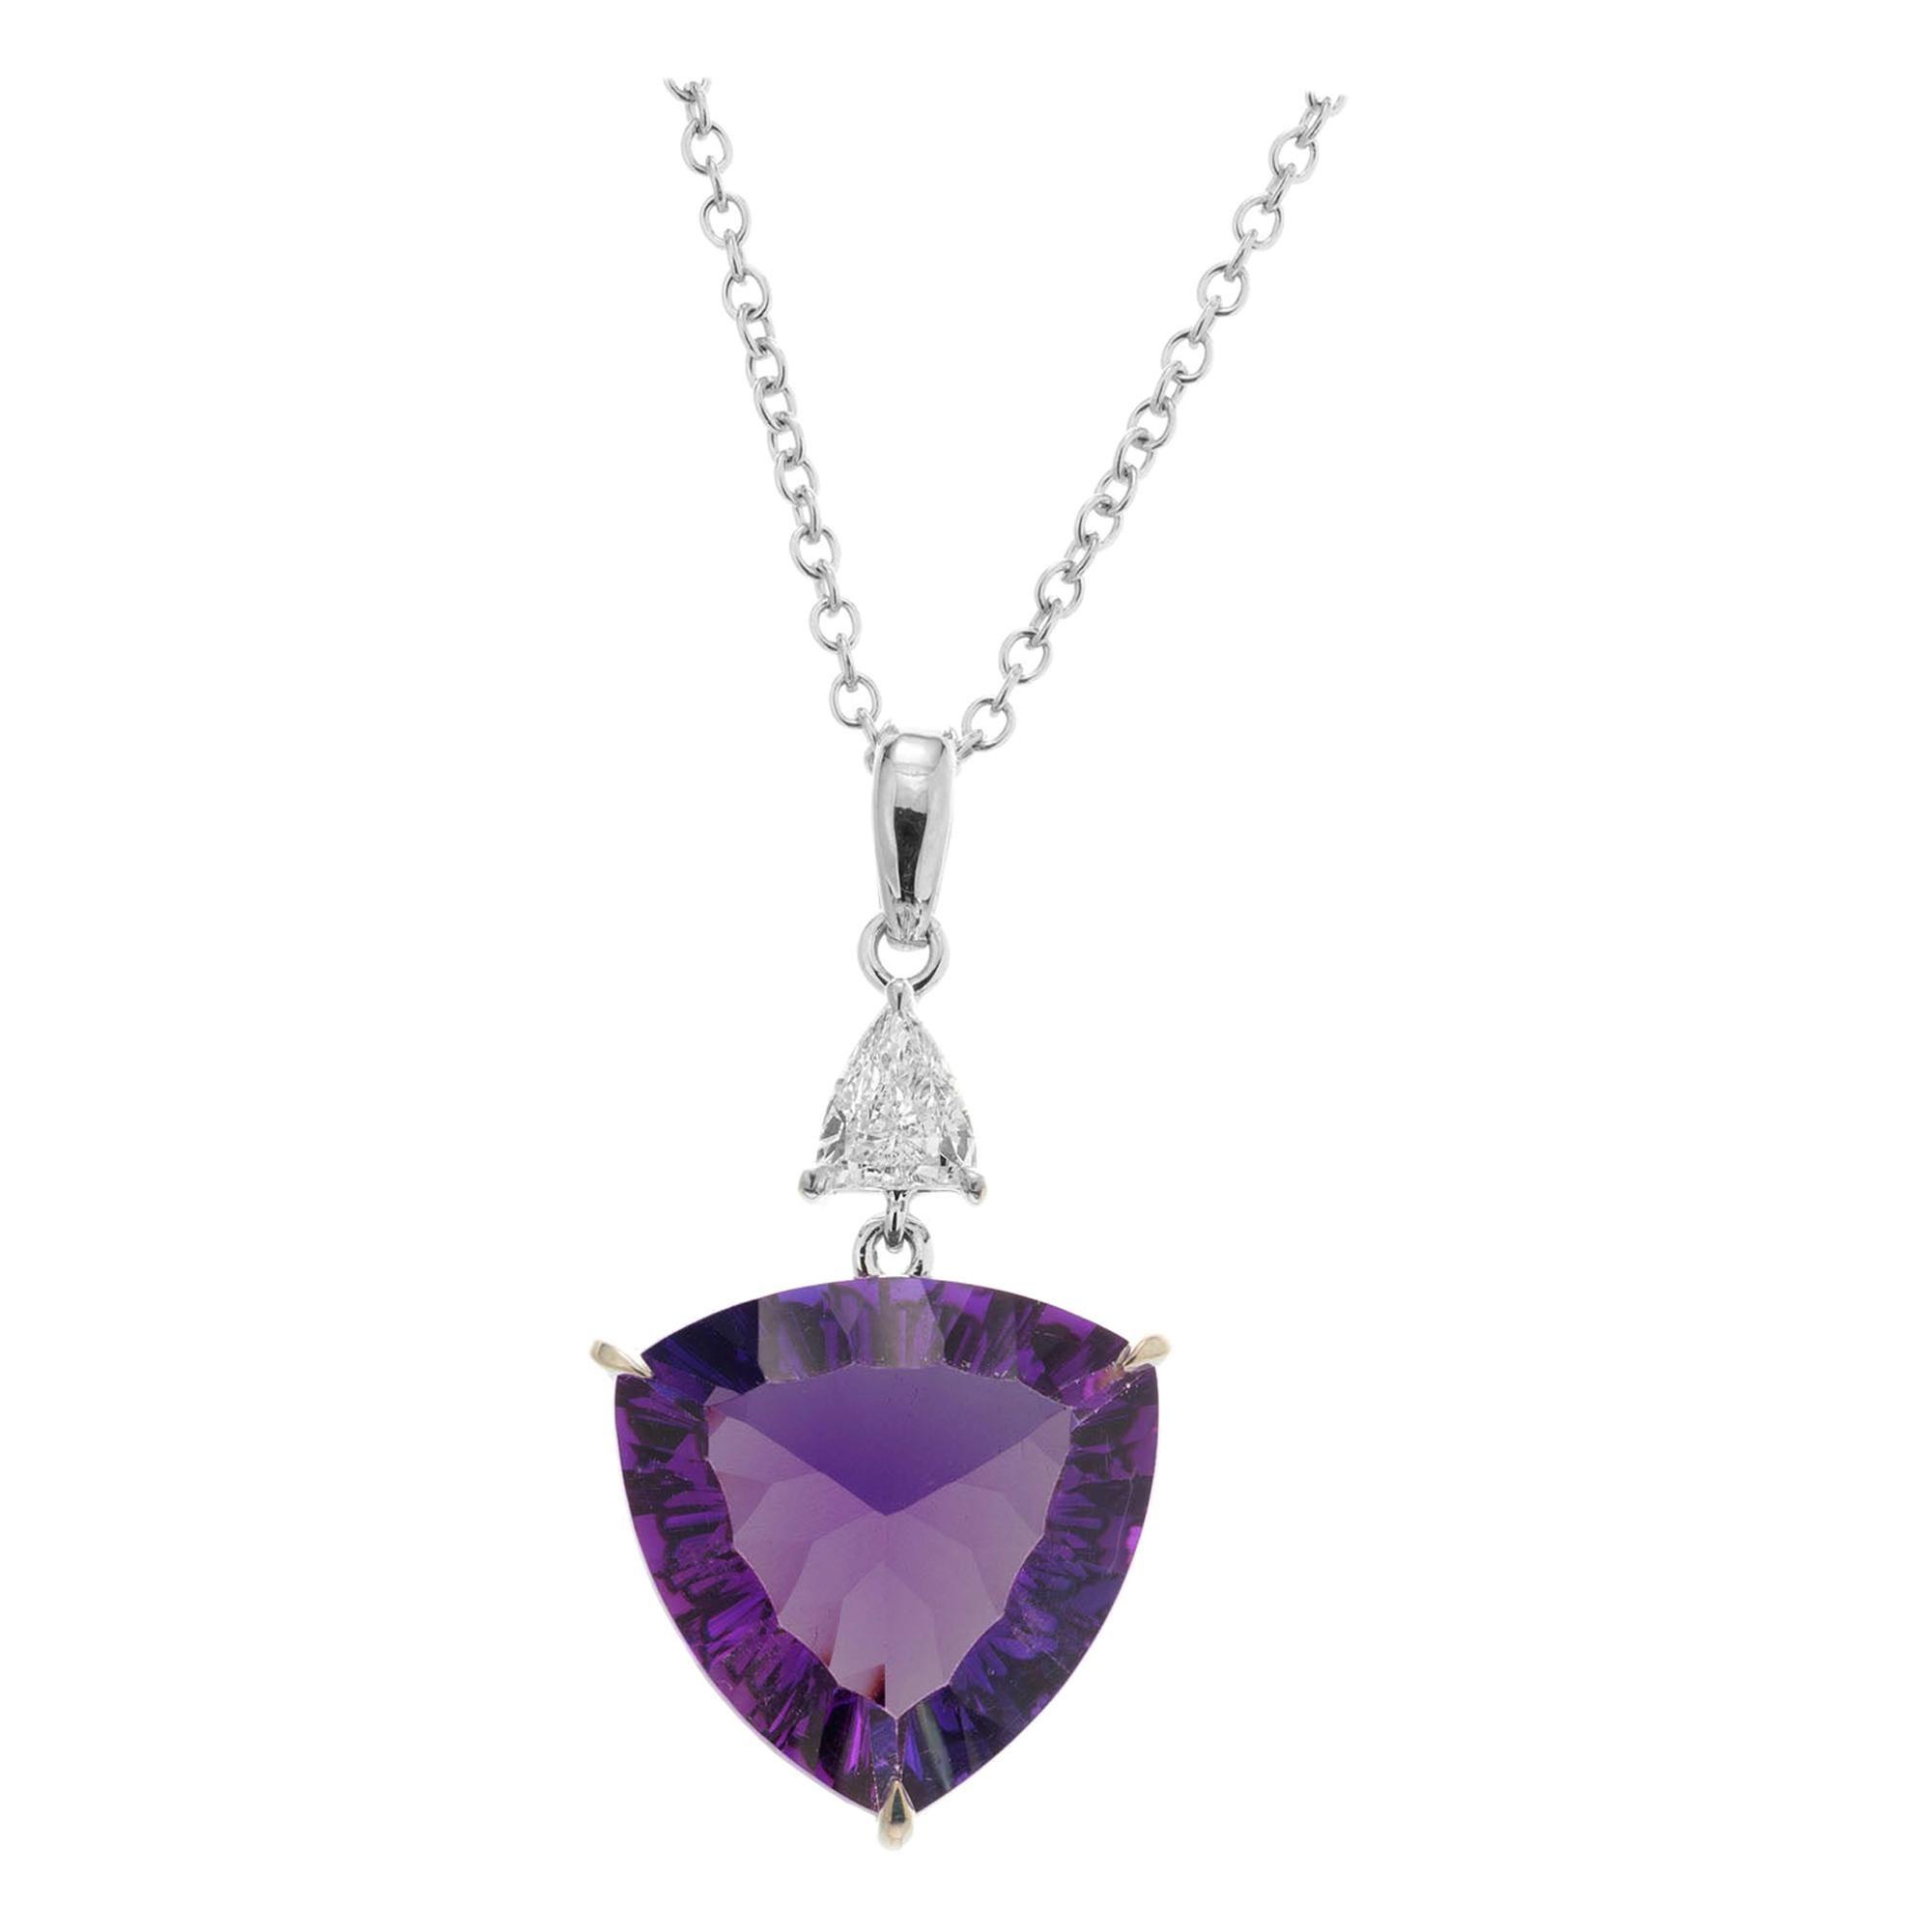 Peter Suchy 9.25 Carat Amethyst Diamond White Gold Pendant Necklace